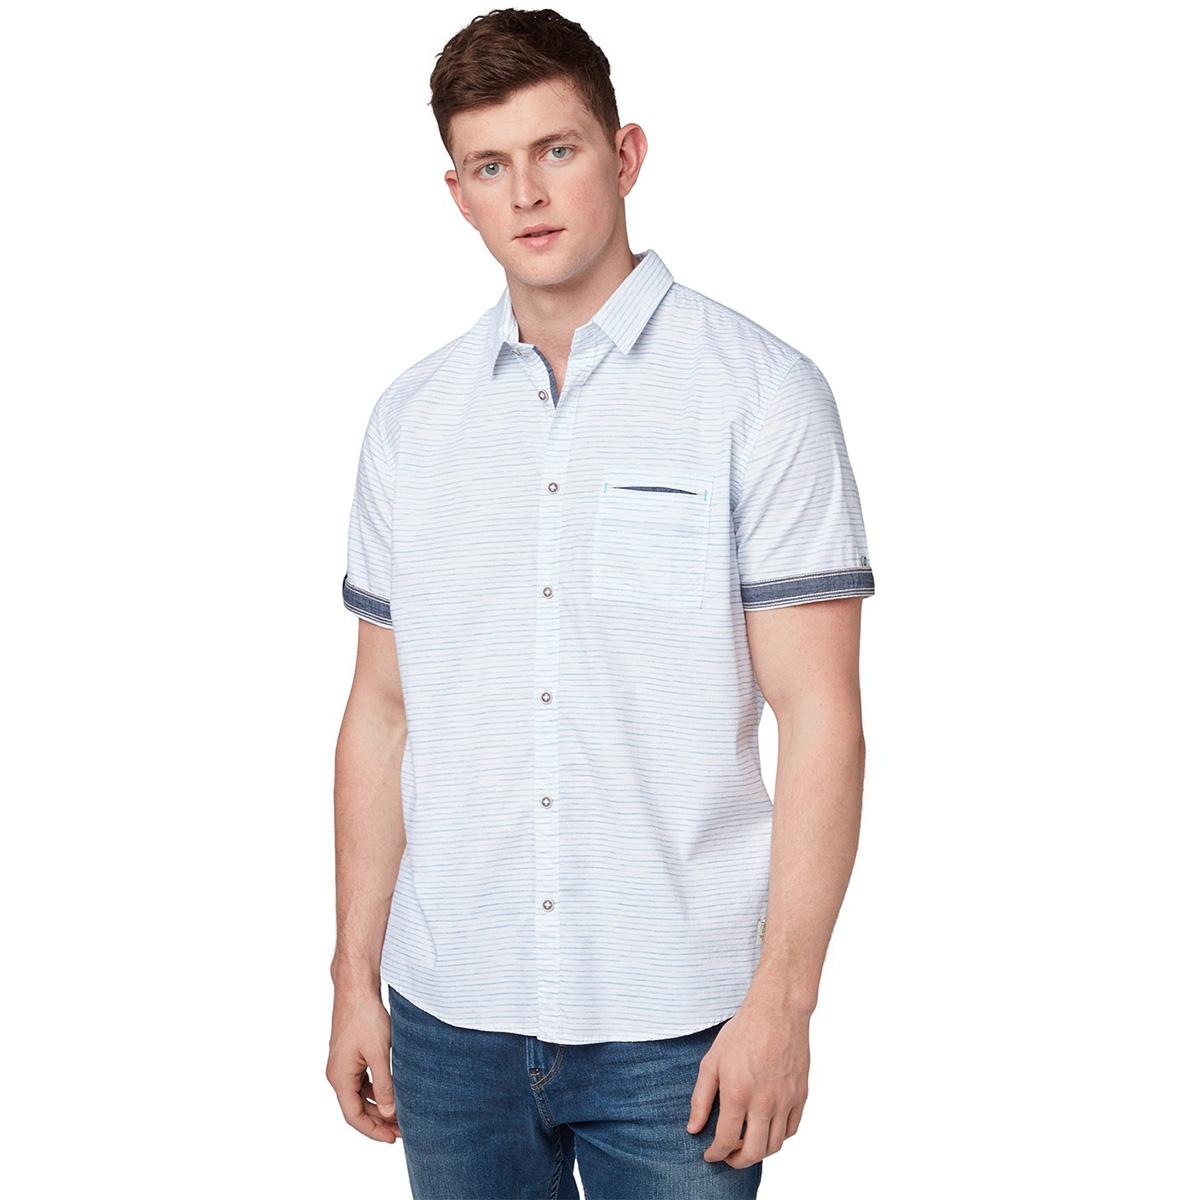 gestreept overhemd 1010110xx10 tom tailor overhemd 17297